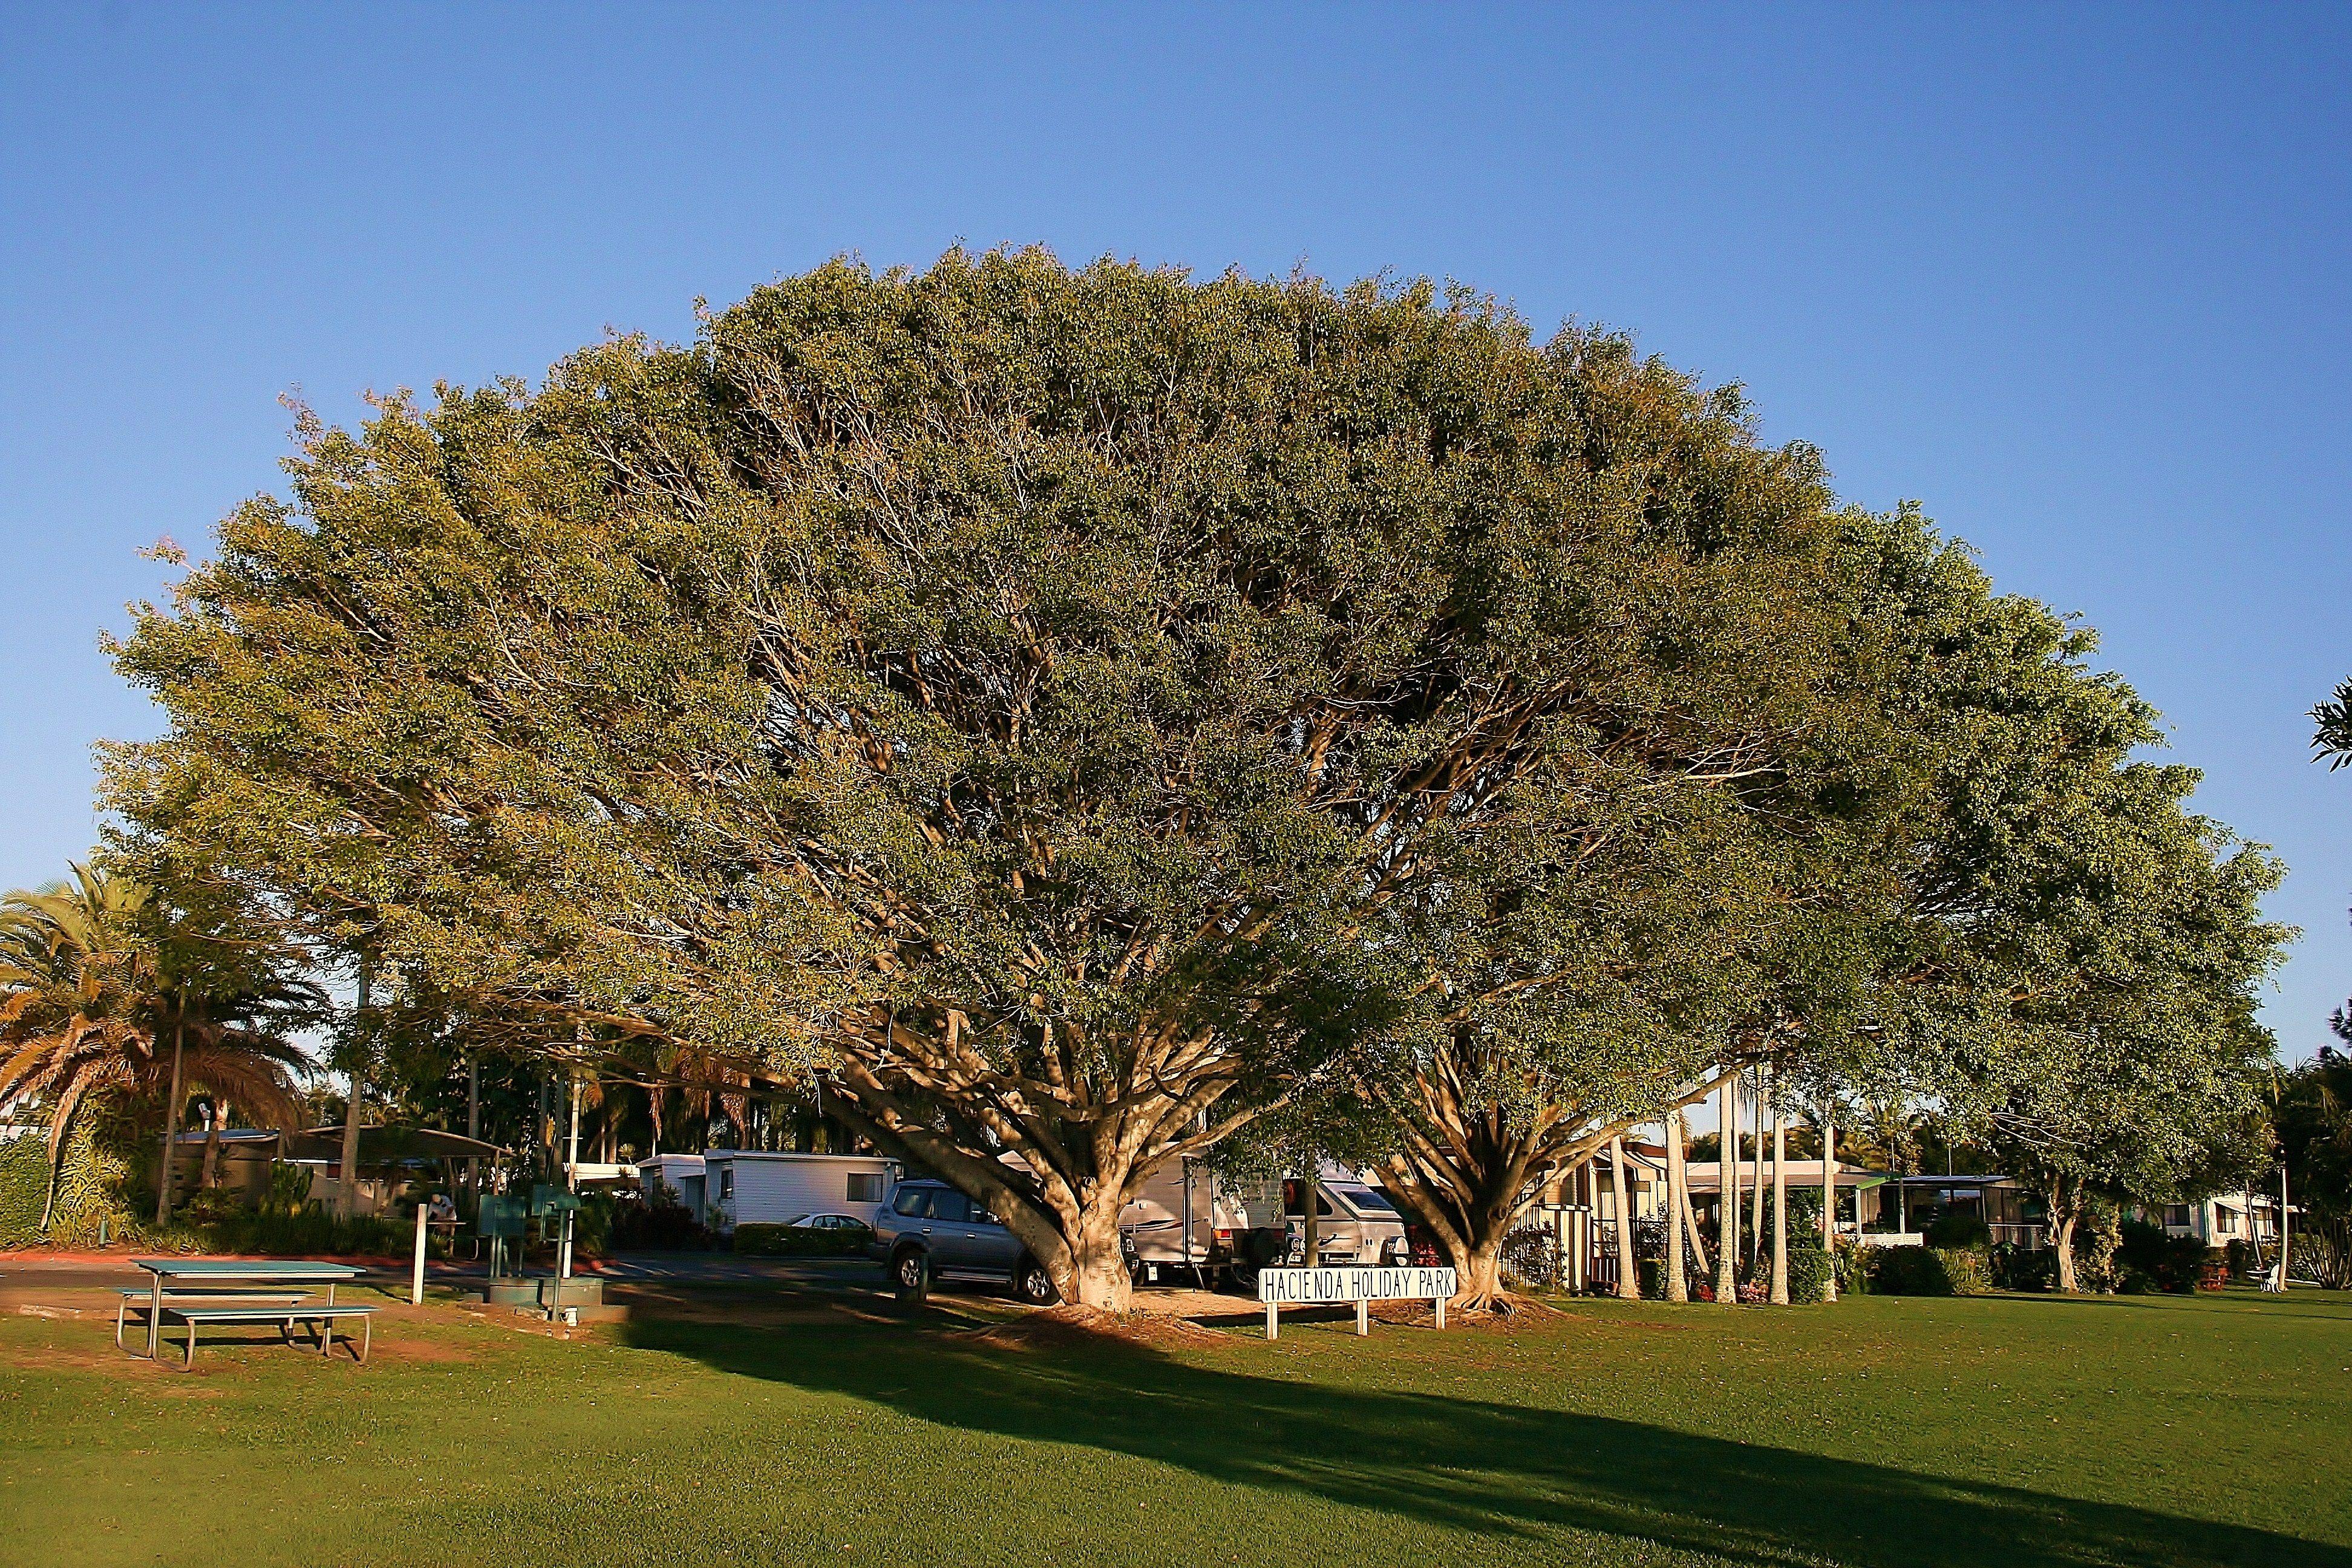 Figtree Australia  city photos gallery : Large fig tree Australia | David Allen, photographer | Pinterest